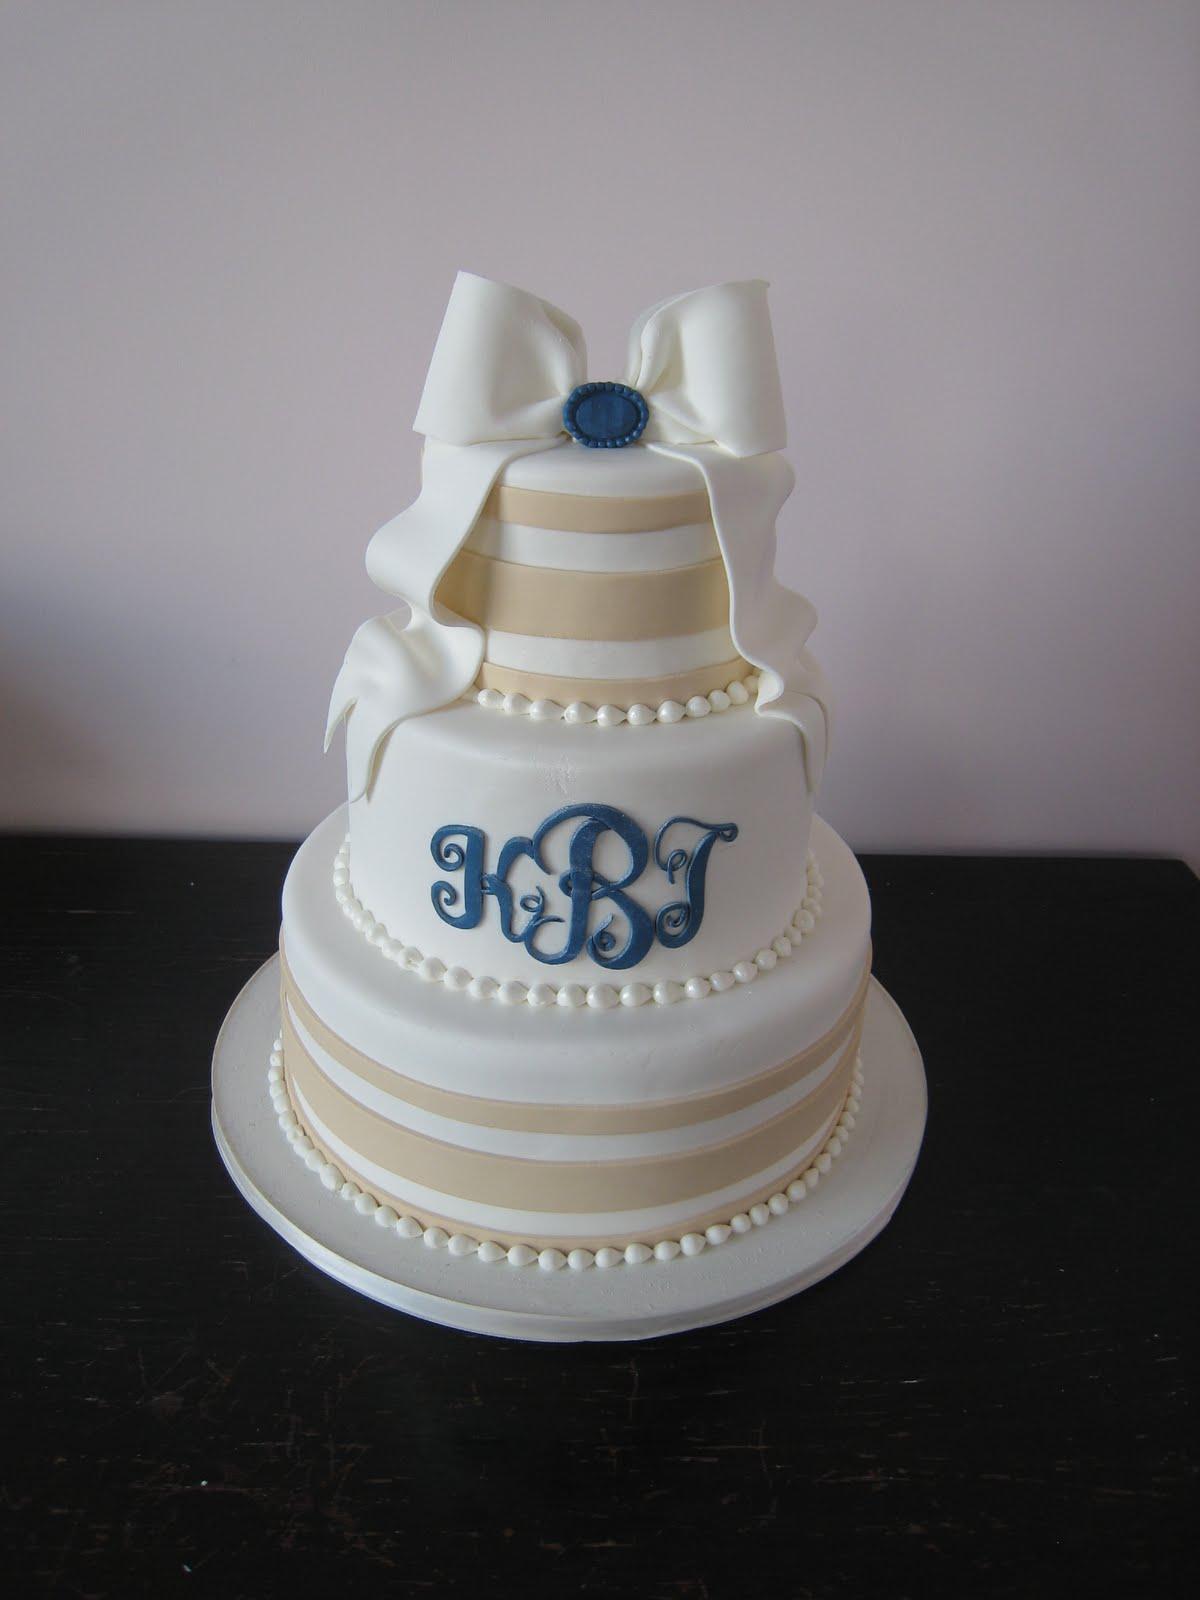 Elegant Wedding Cakes in, wedding centerpieces